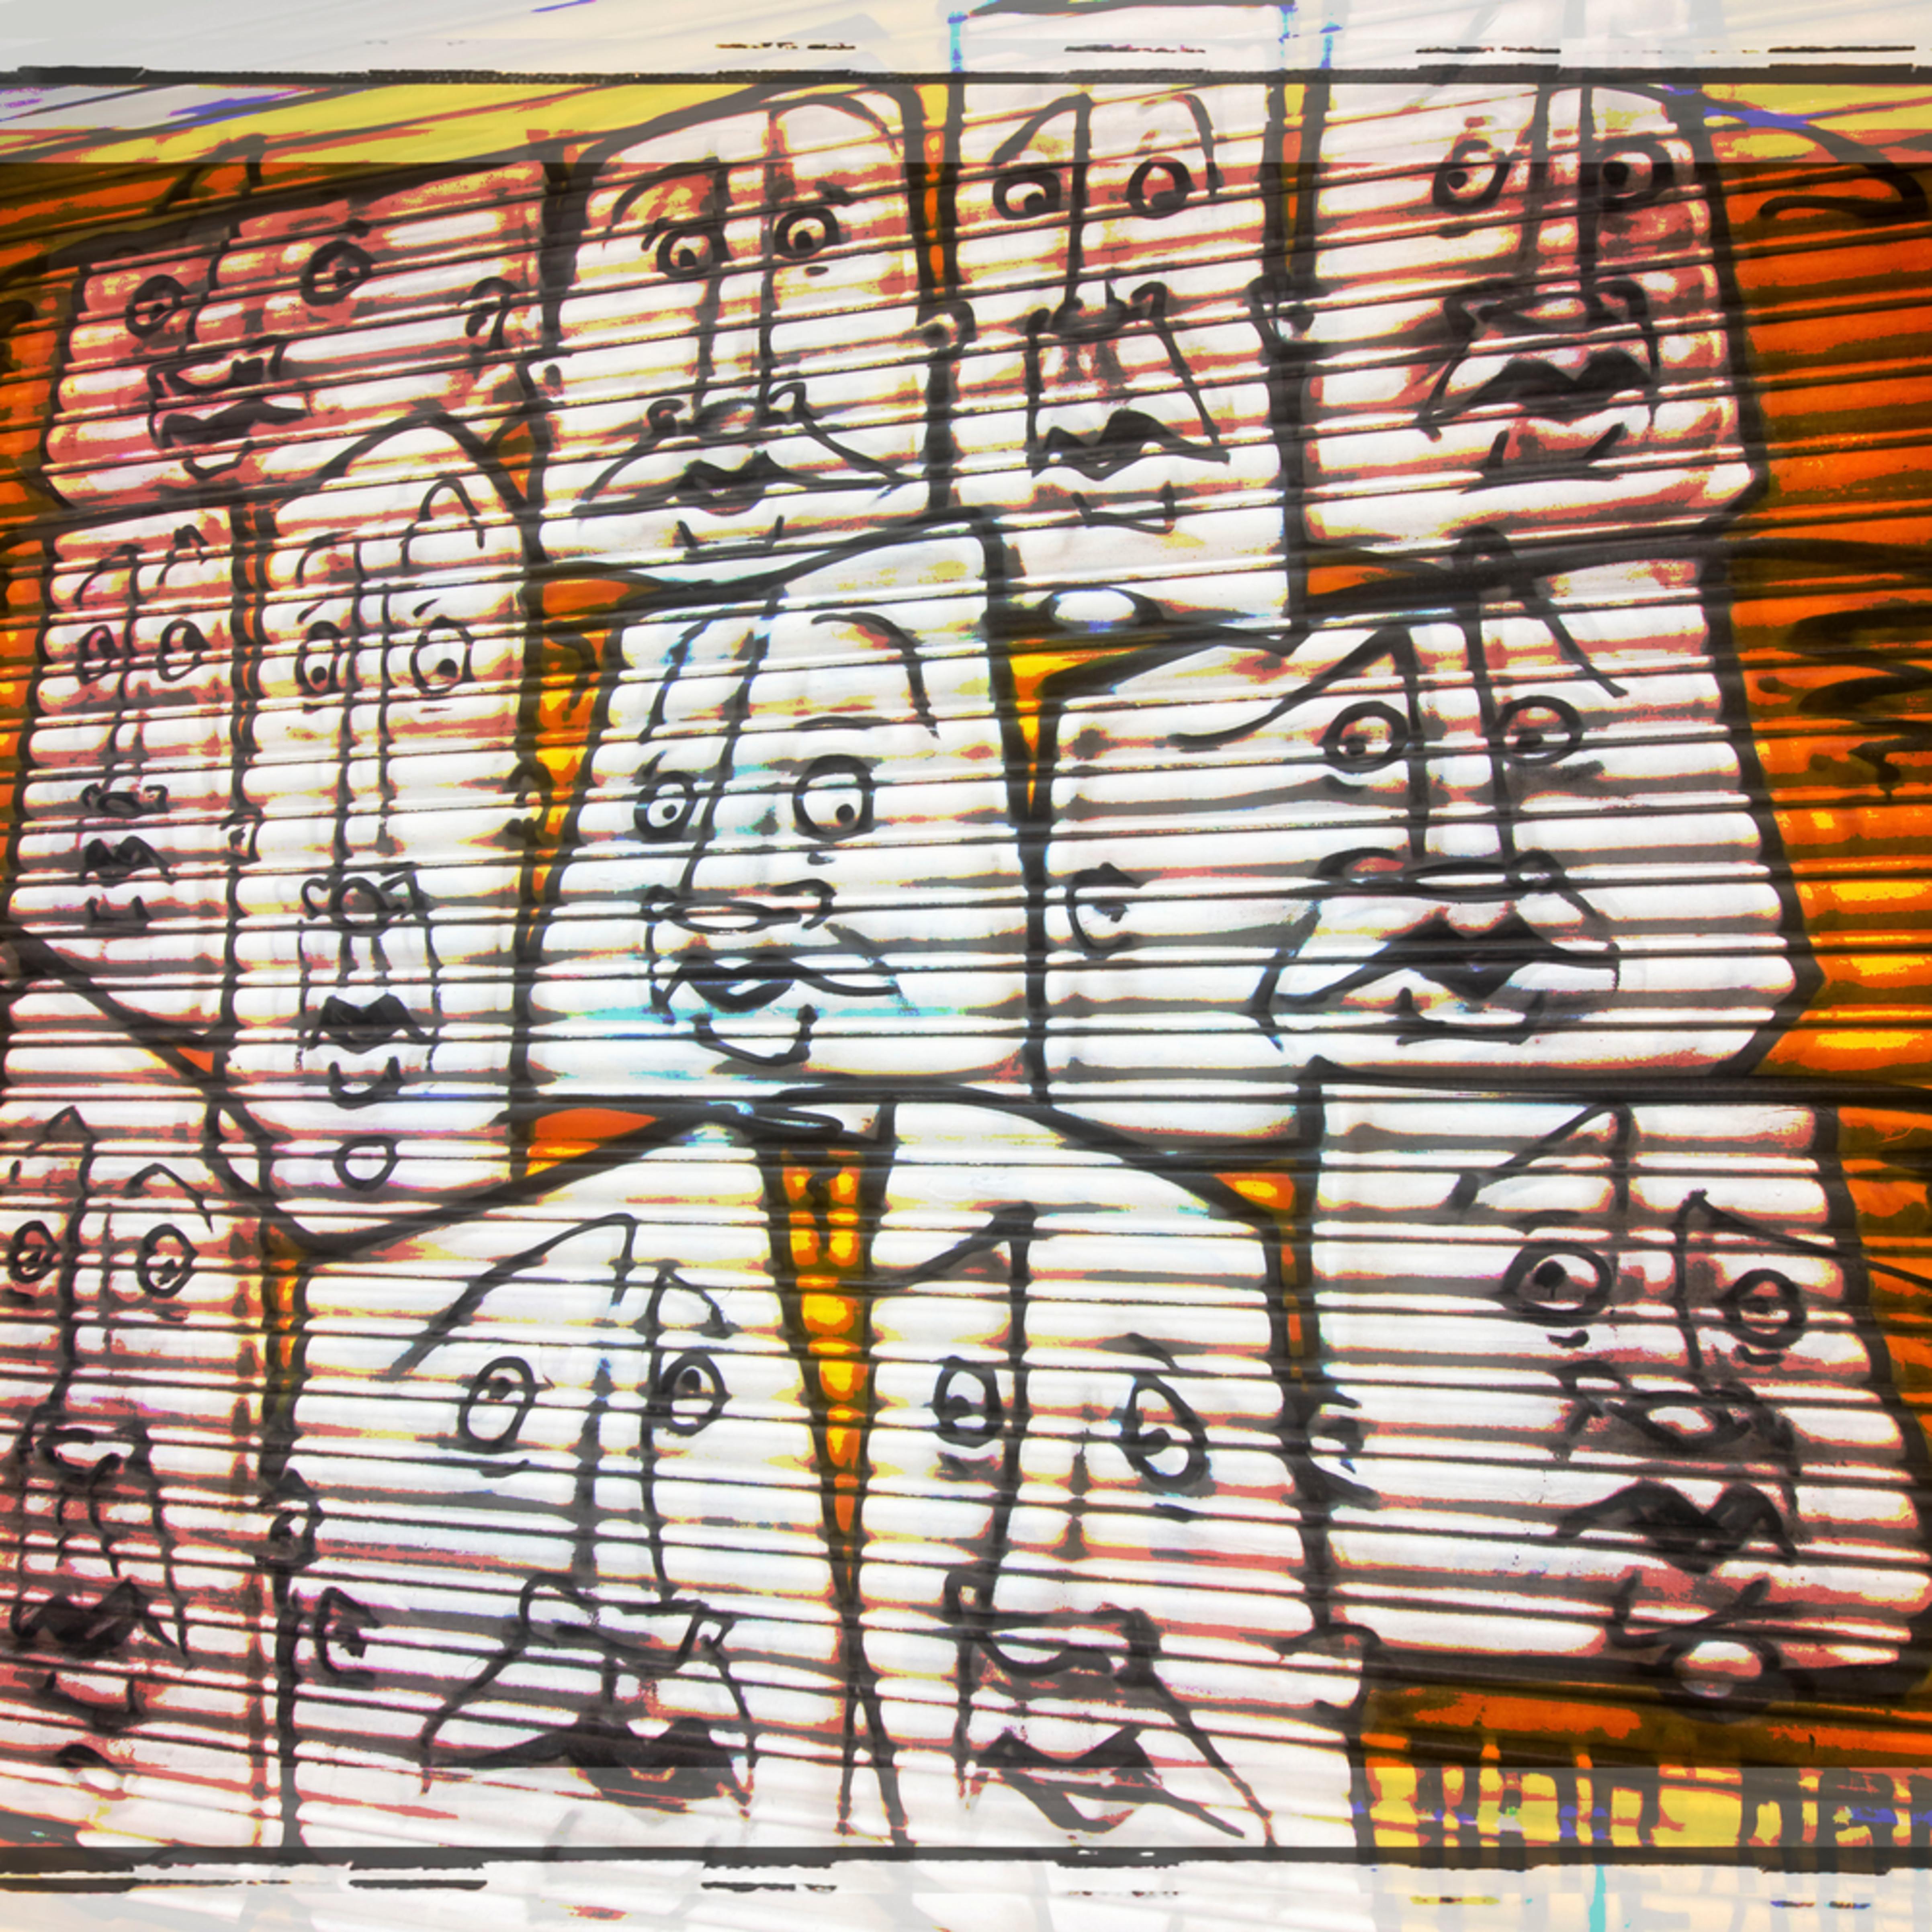 Shoreditch graffiti 6 yuvzxq